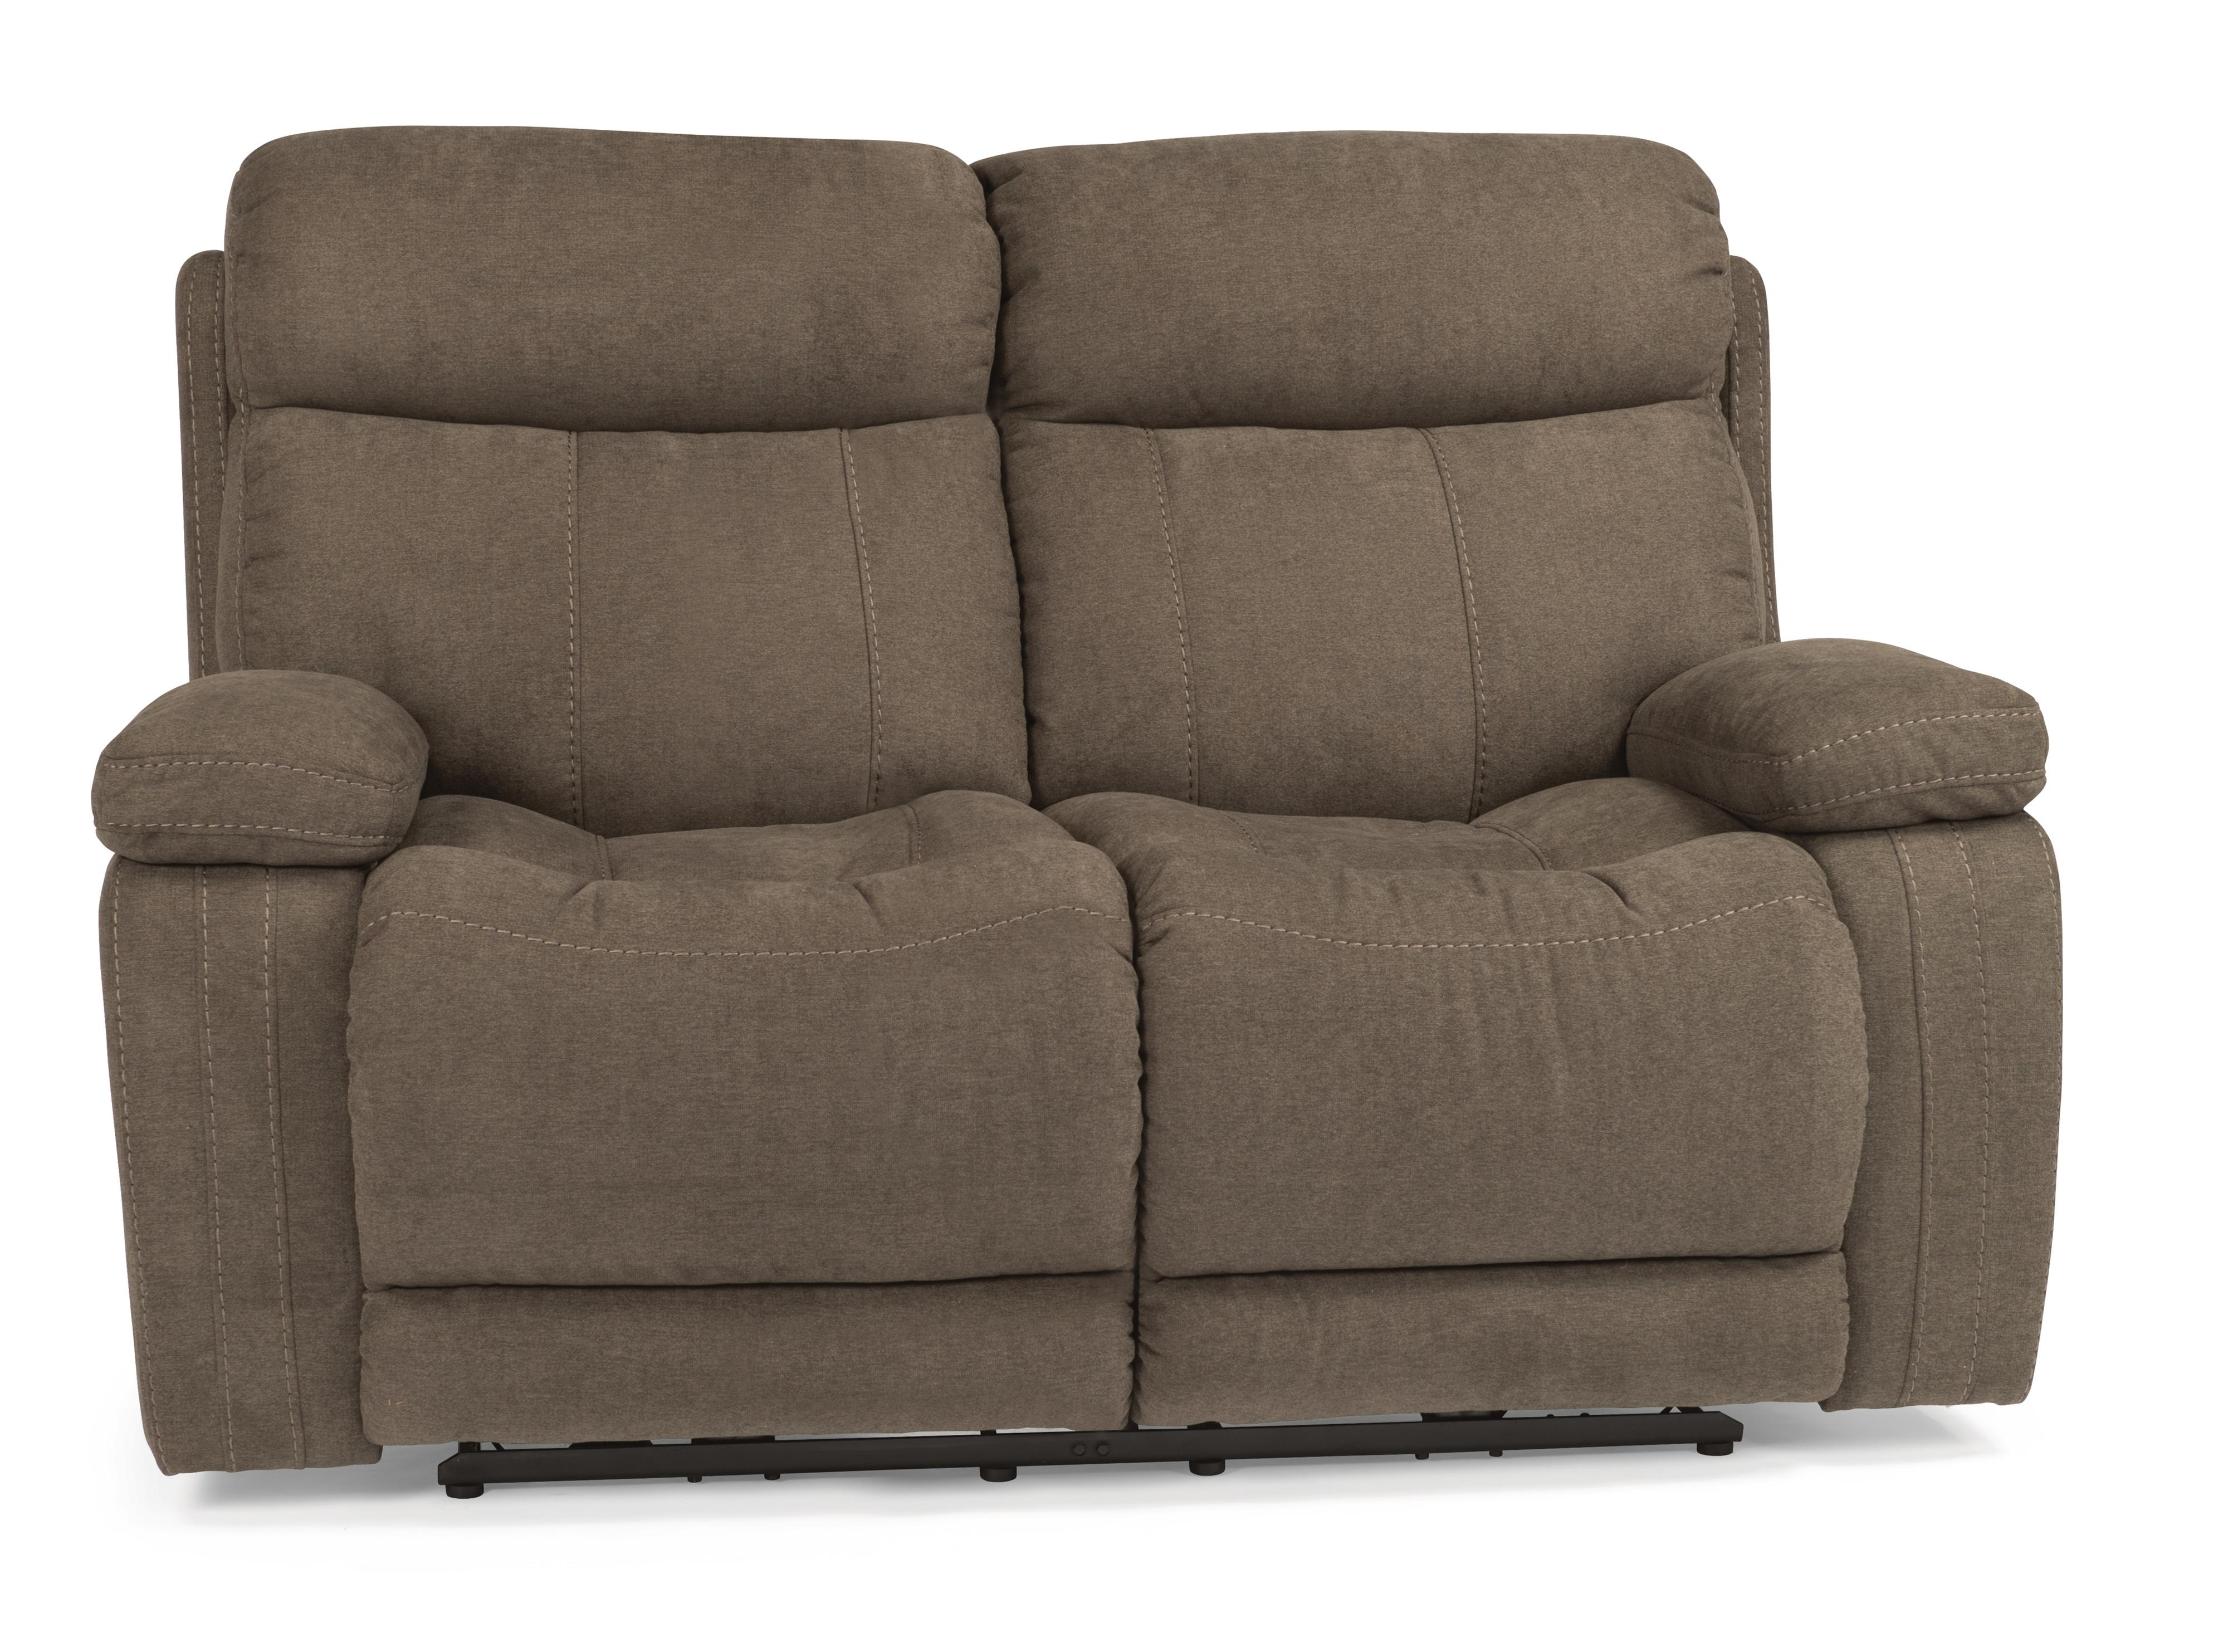 Flexsteel Latitudes Danika Casual Power Reclining Loveseat With Contrast Topstitching Dubois Furniture Love Seats Waco Temple Killeen Texas